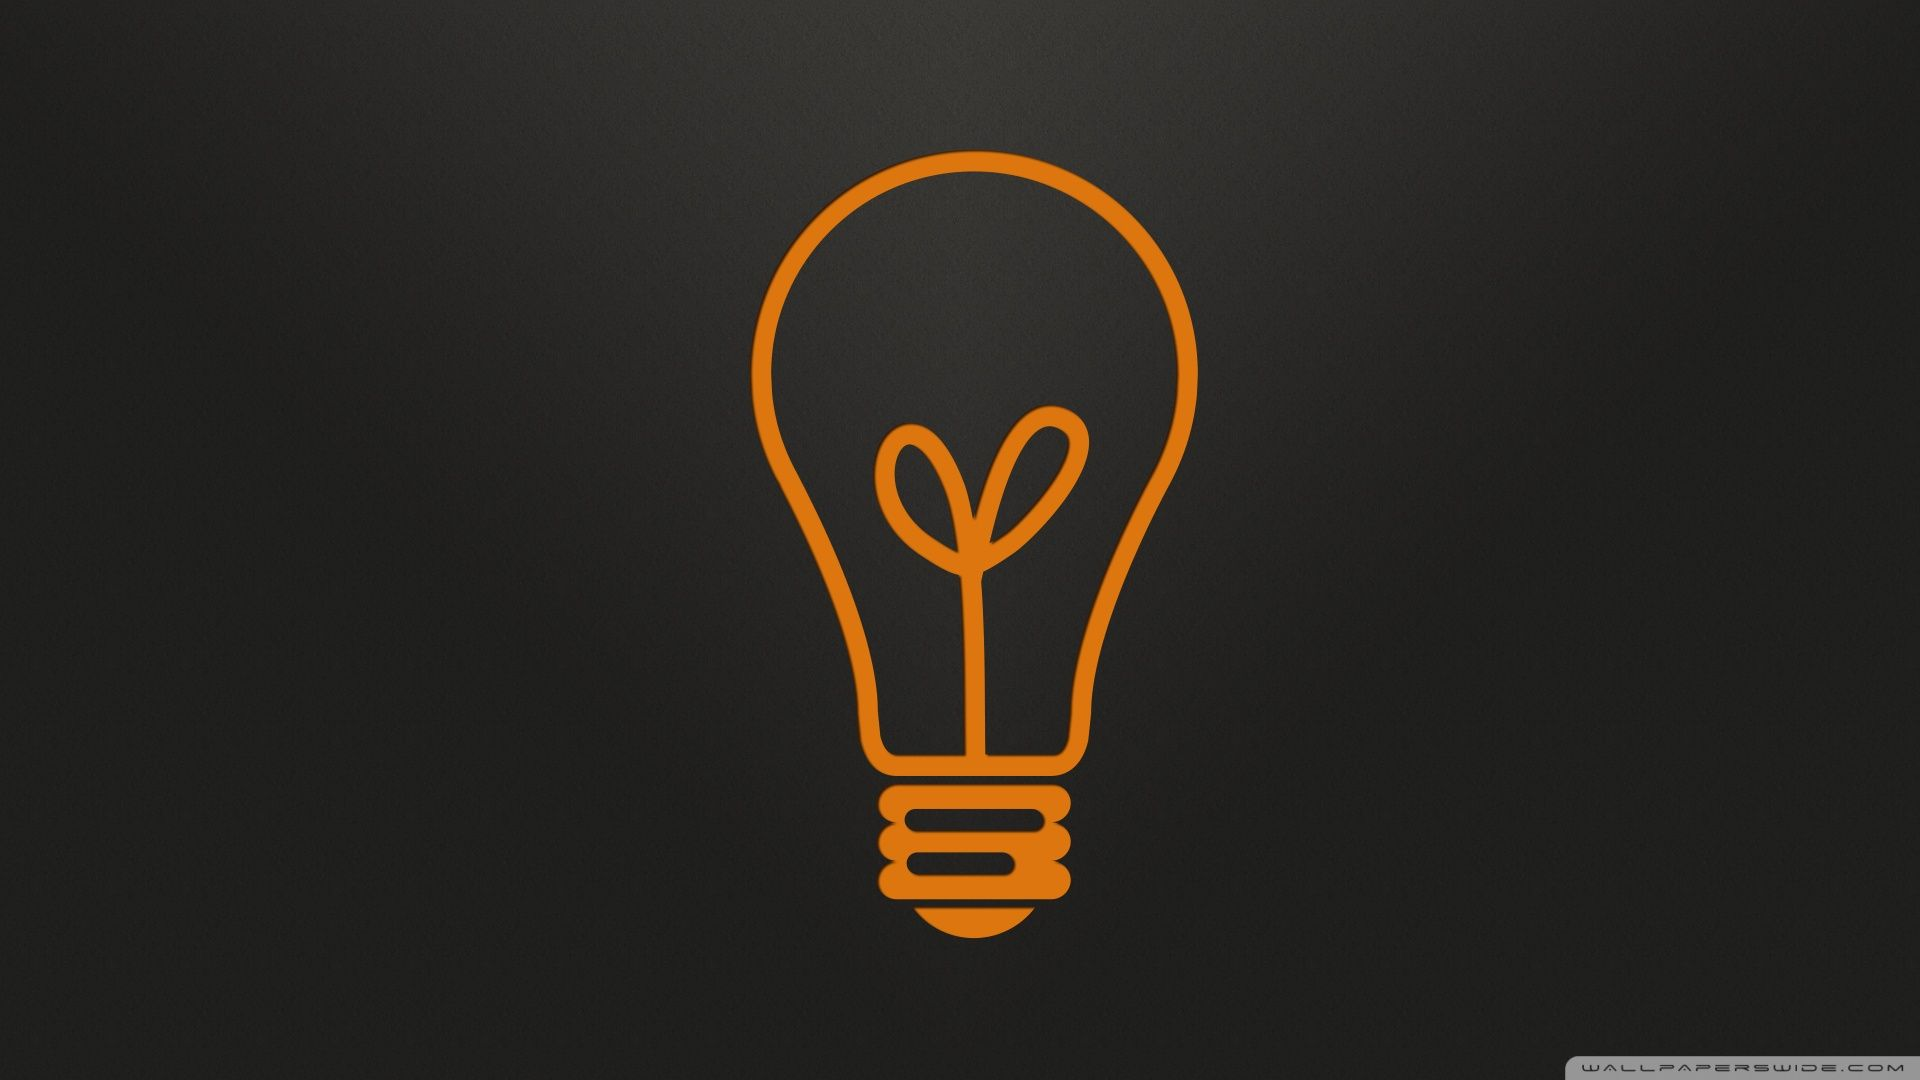 30 Light Bulb Wallpaper by Severin Baroch GoldWallpapers